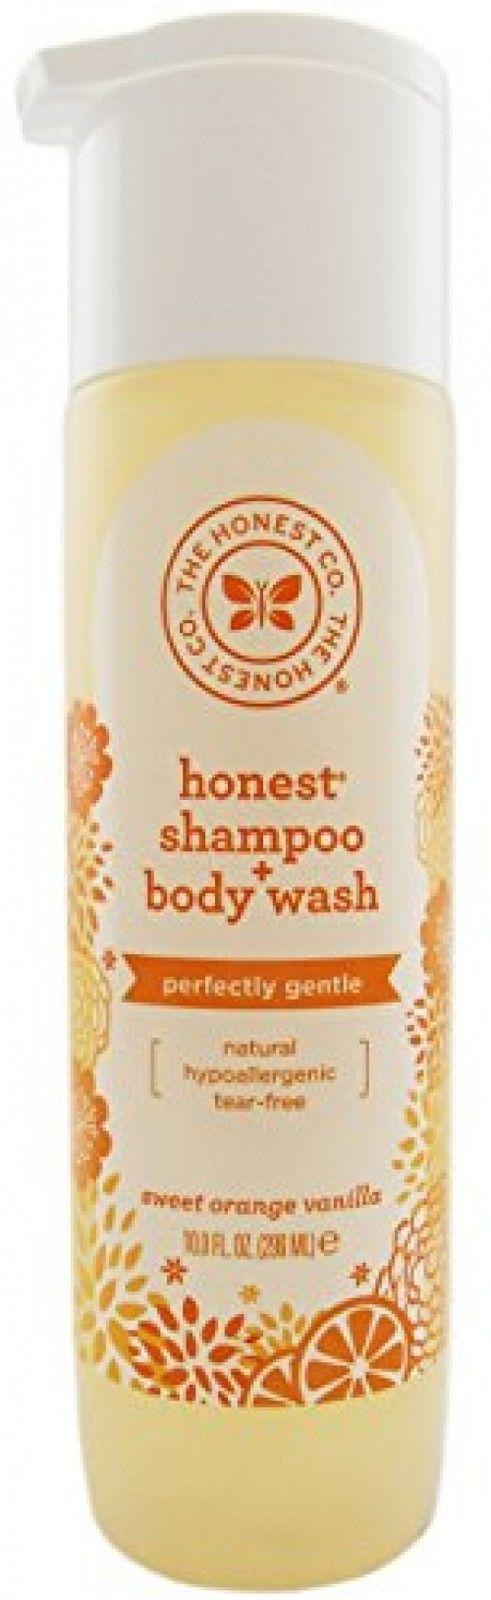 The Honest Company Shampoo and Body Wash, Sweet Orange Vanilla, 10 OZ 6 PACK